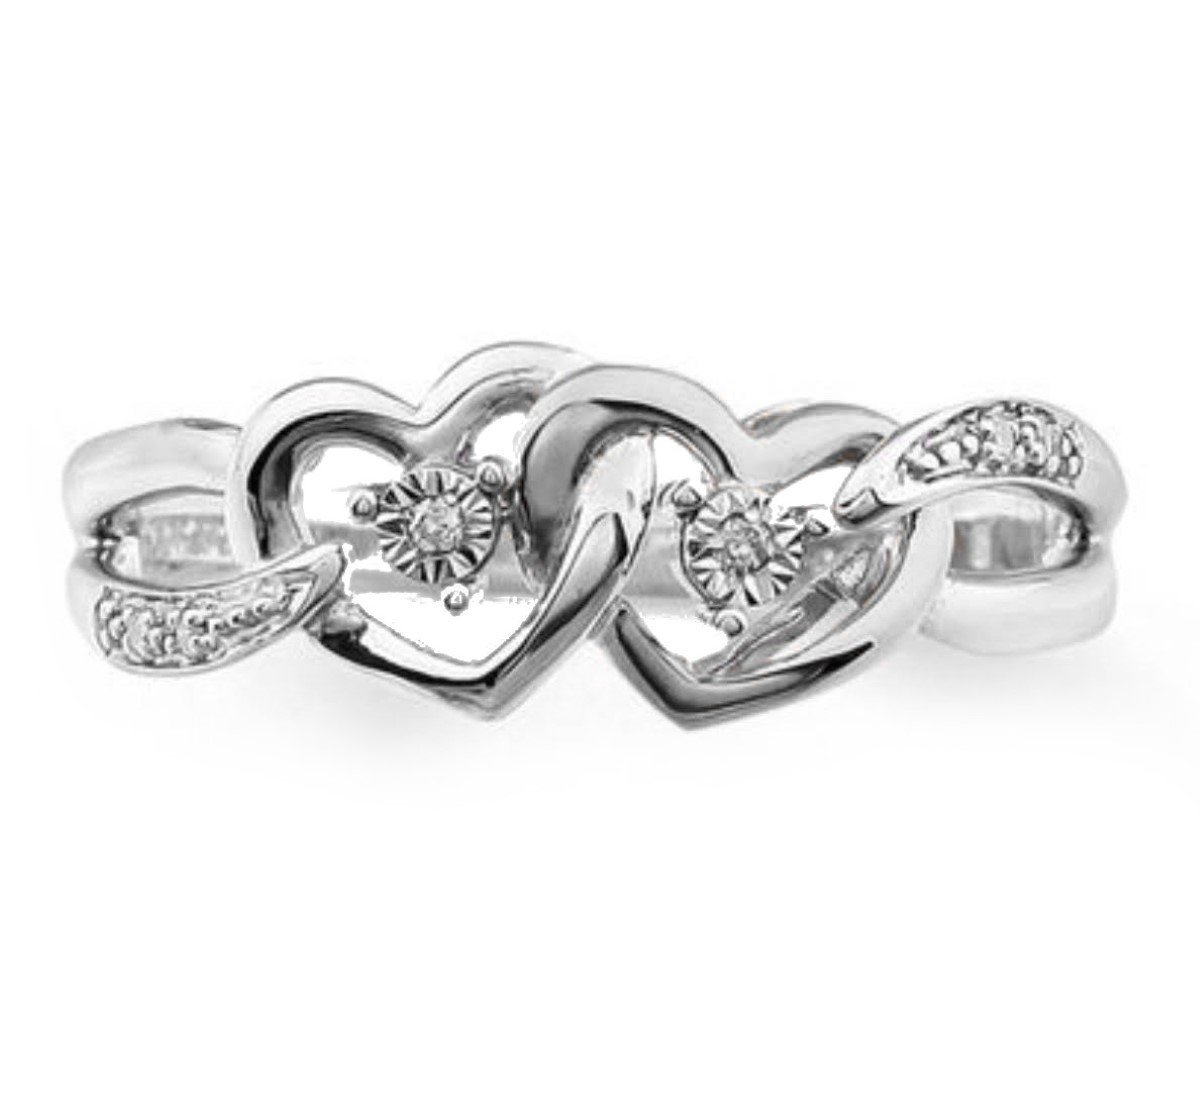 10K White Gold Twin Hearts Ring 0.03ctw Diamond Split Sides Interlocking Heart Promise Engagement Ring